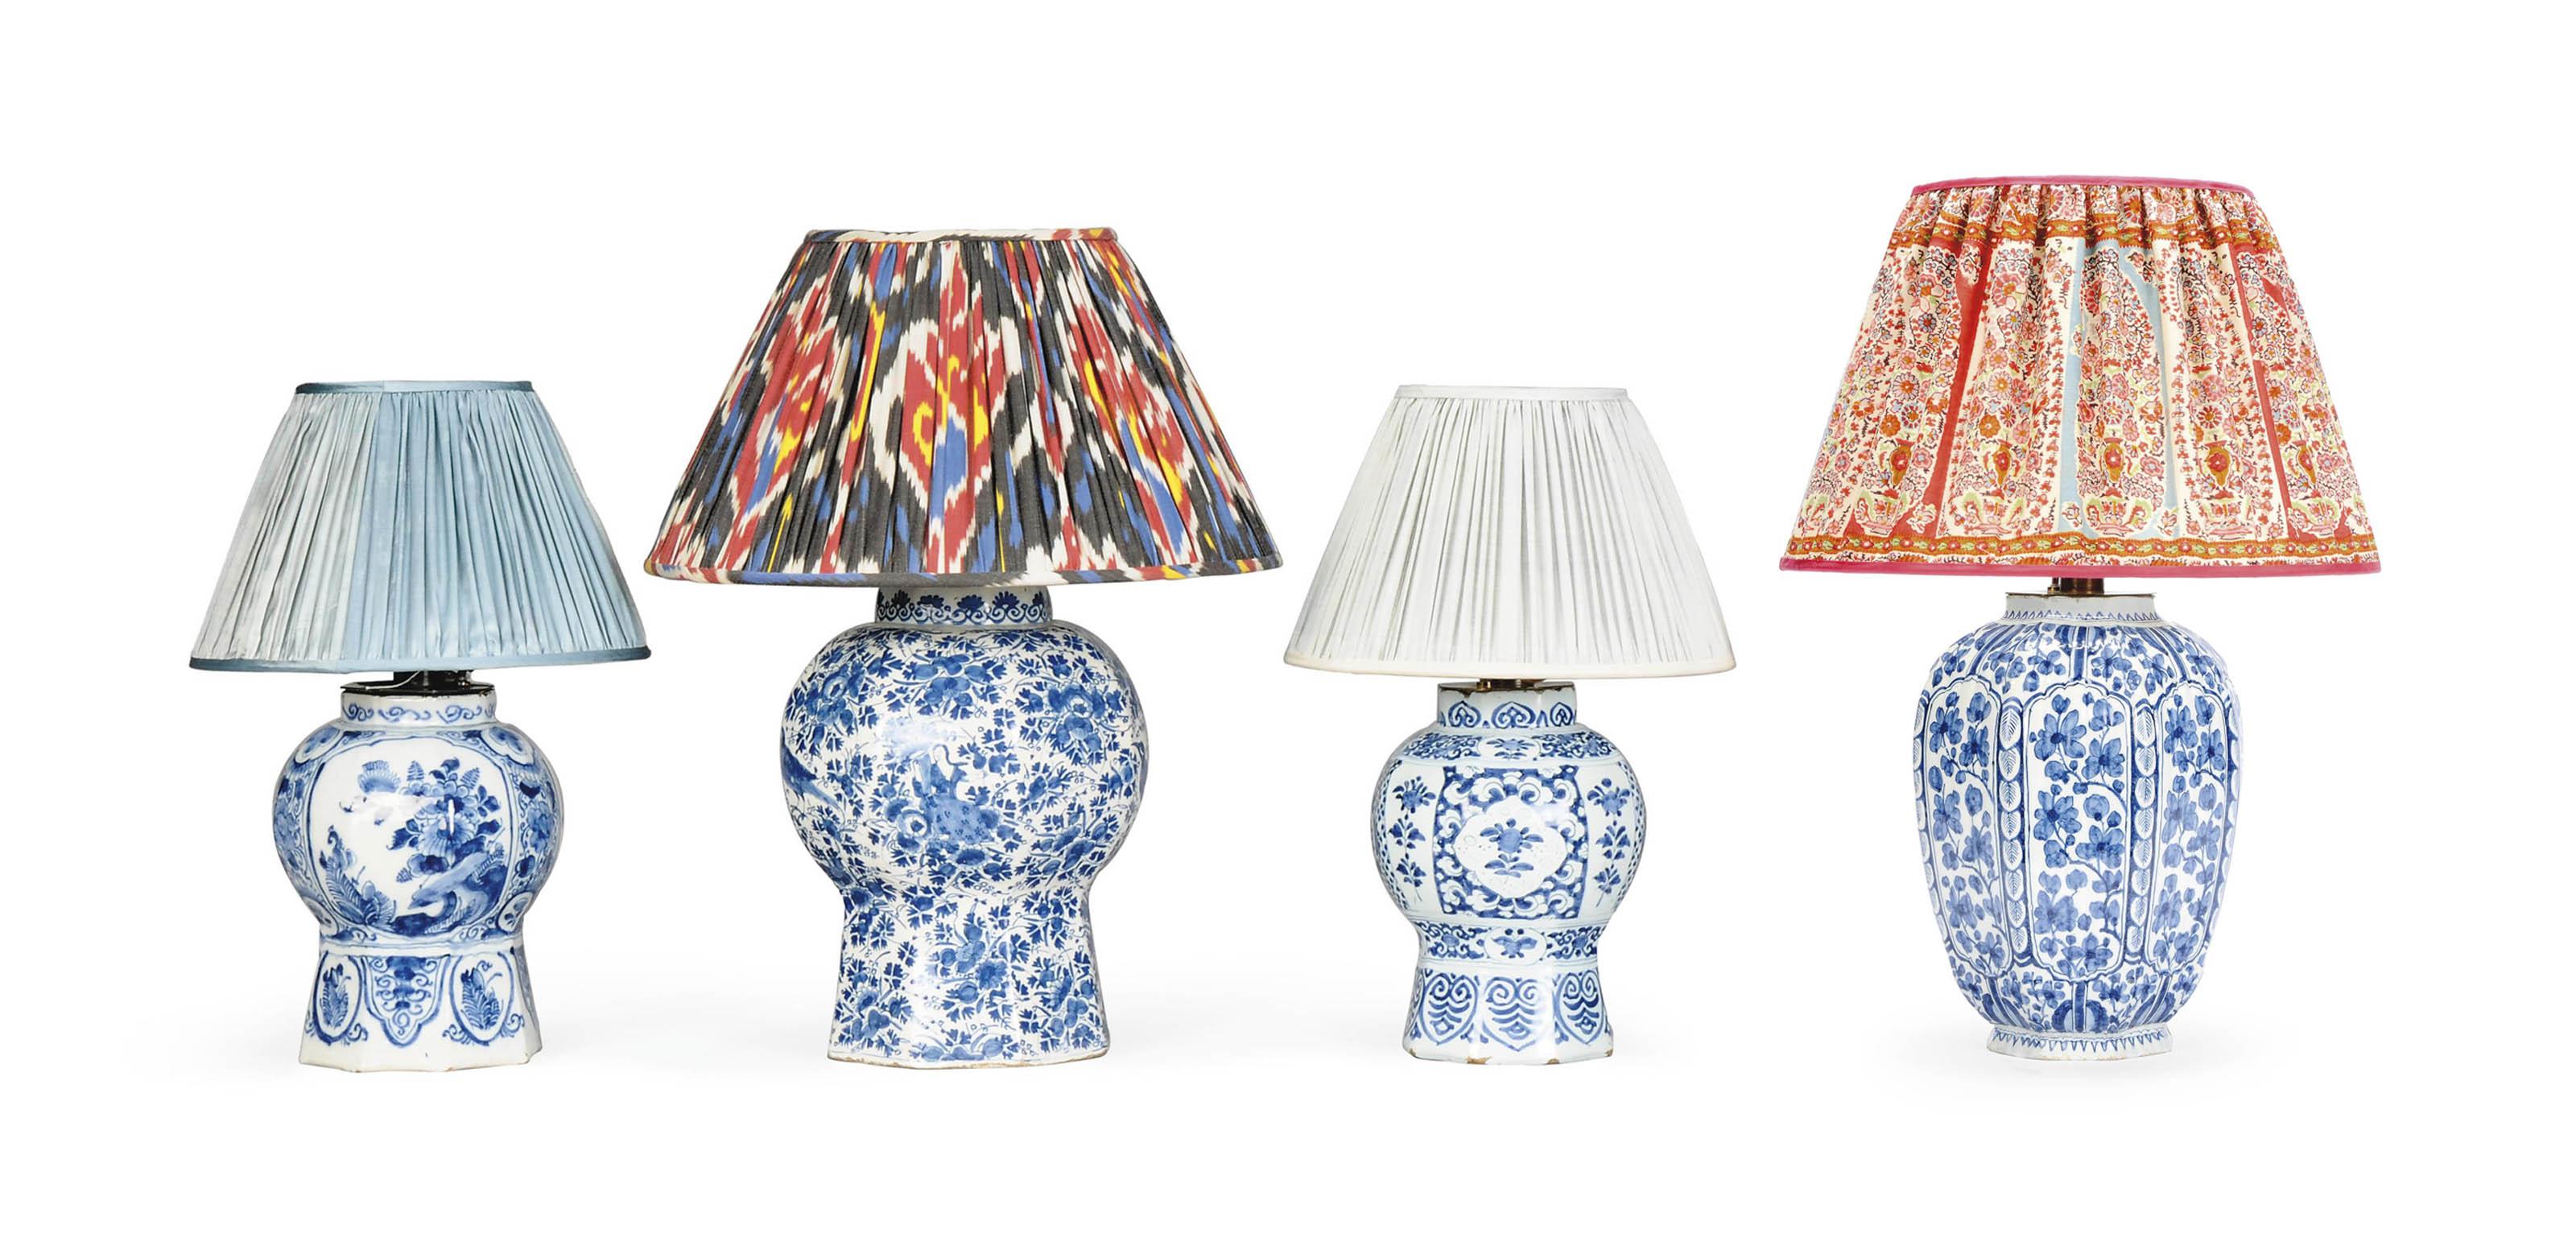 FOUR DUTCH DELFT BLUE AND WHITE VASE LAMPS